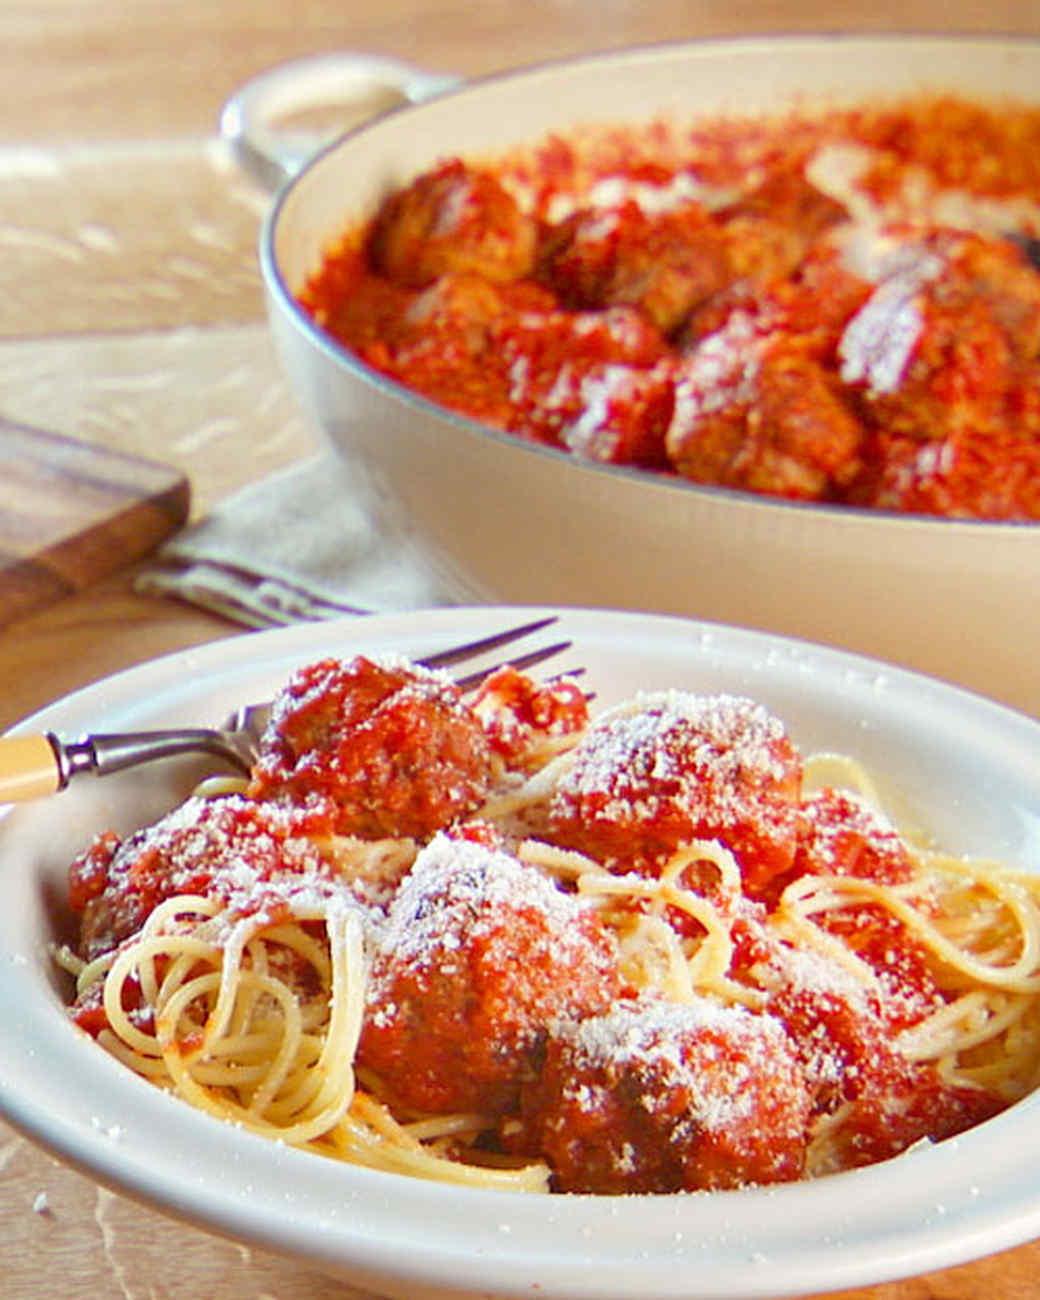 mh_1034_spaghetti_with_meatballs.jpg